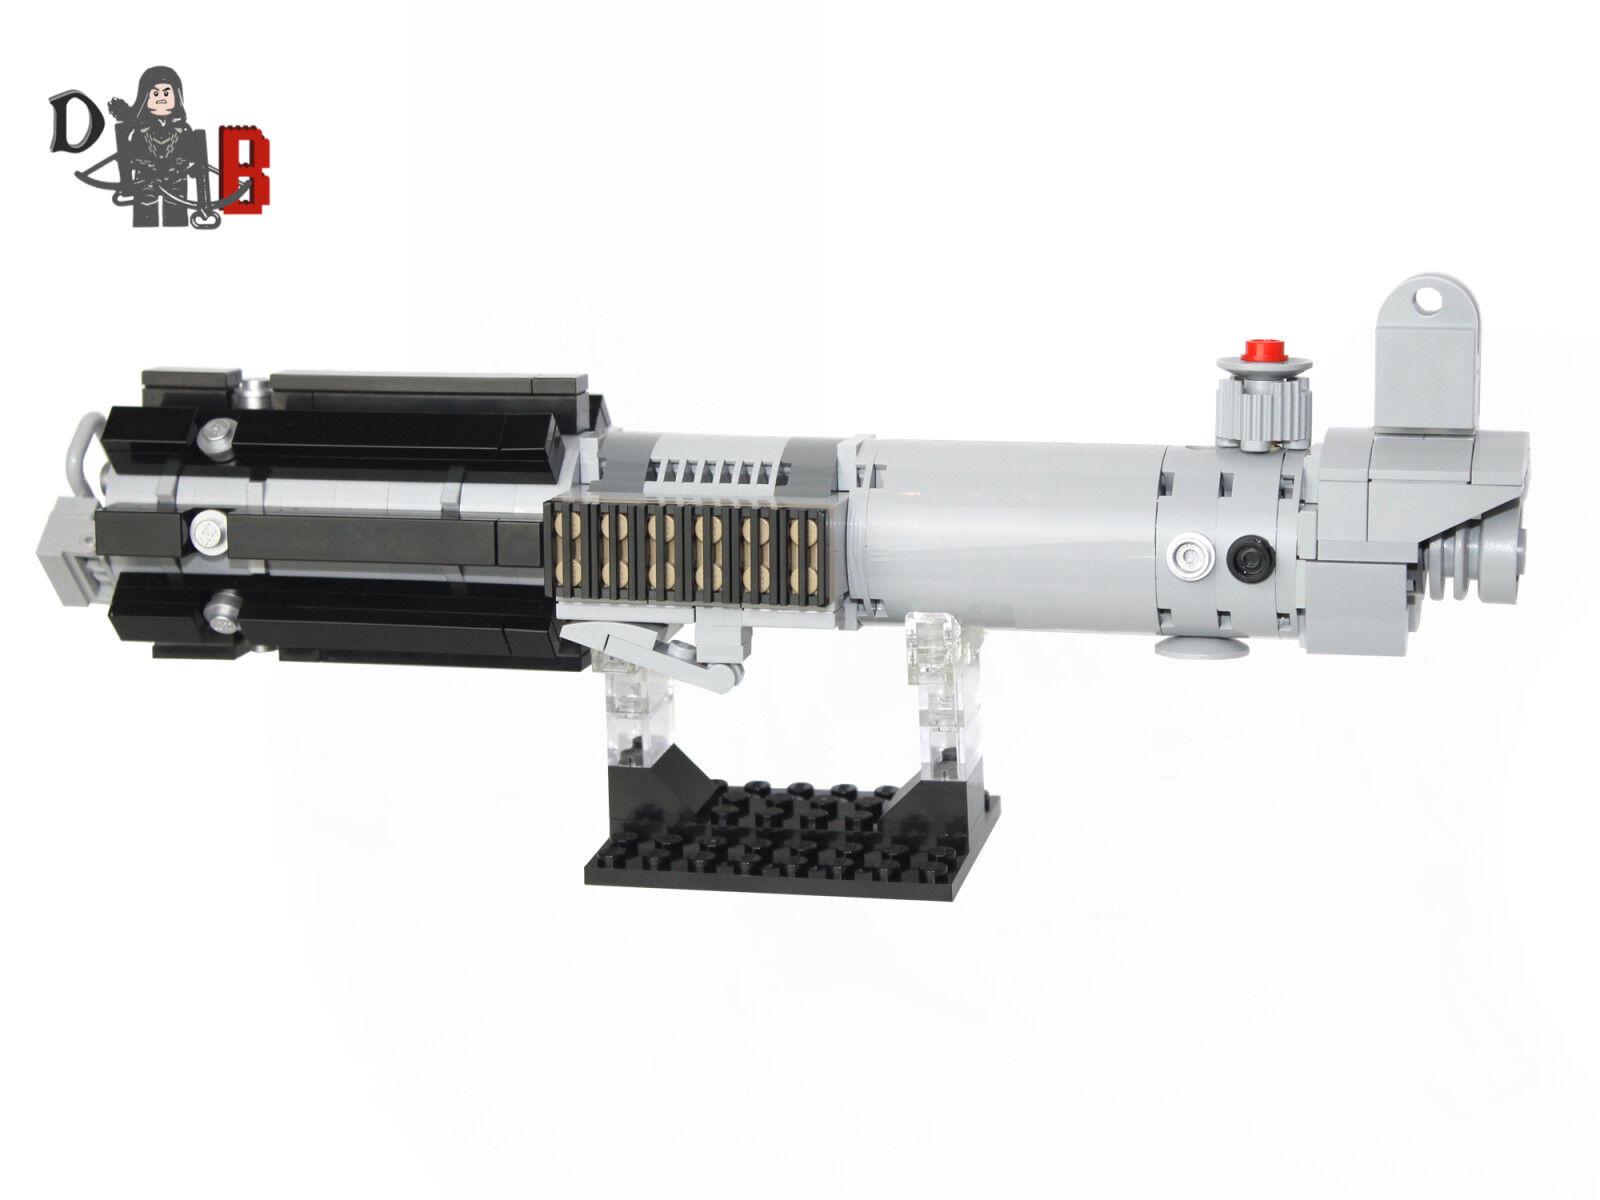 Star Wars ANAKIN / / / LUC / Rey TFA custom graflex achats effectuées à l'aide de pièces lego 0e671f